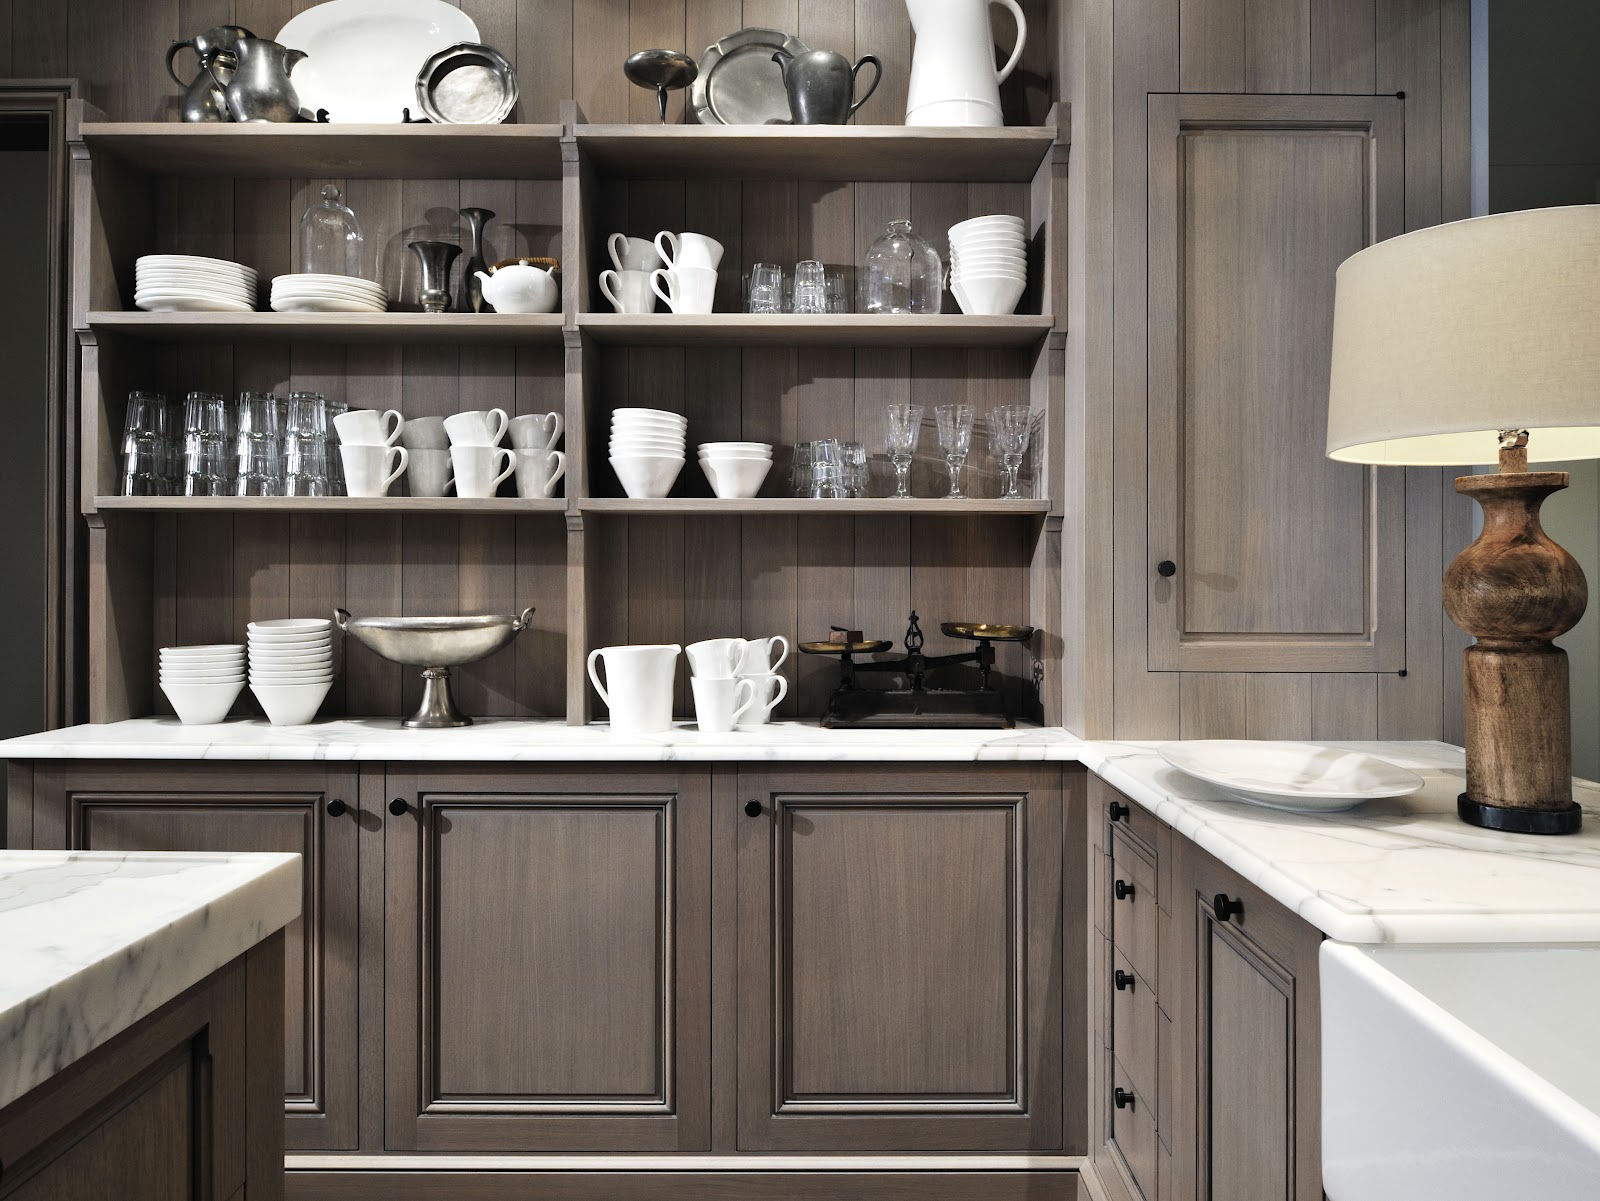 information about home design: Grey wash kitchen cabinets